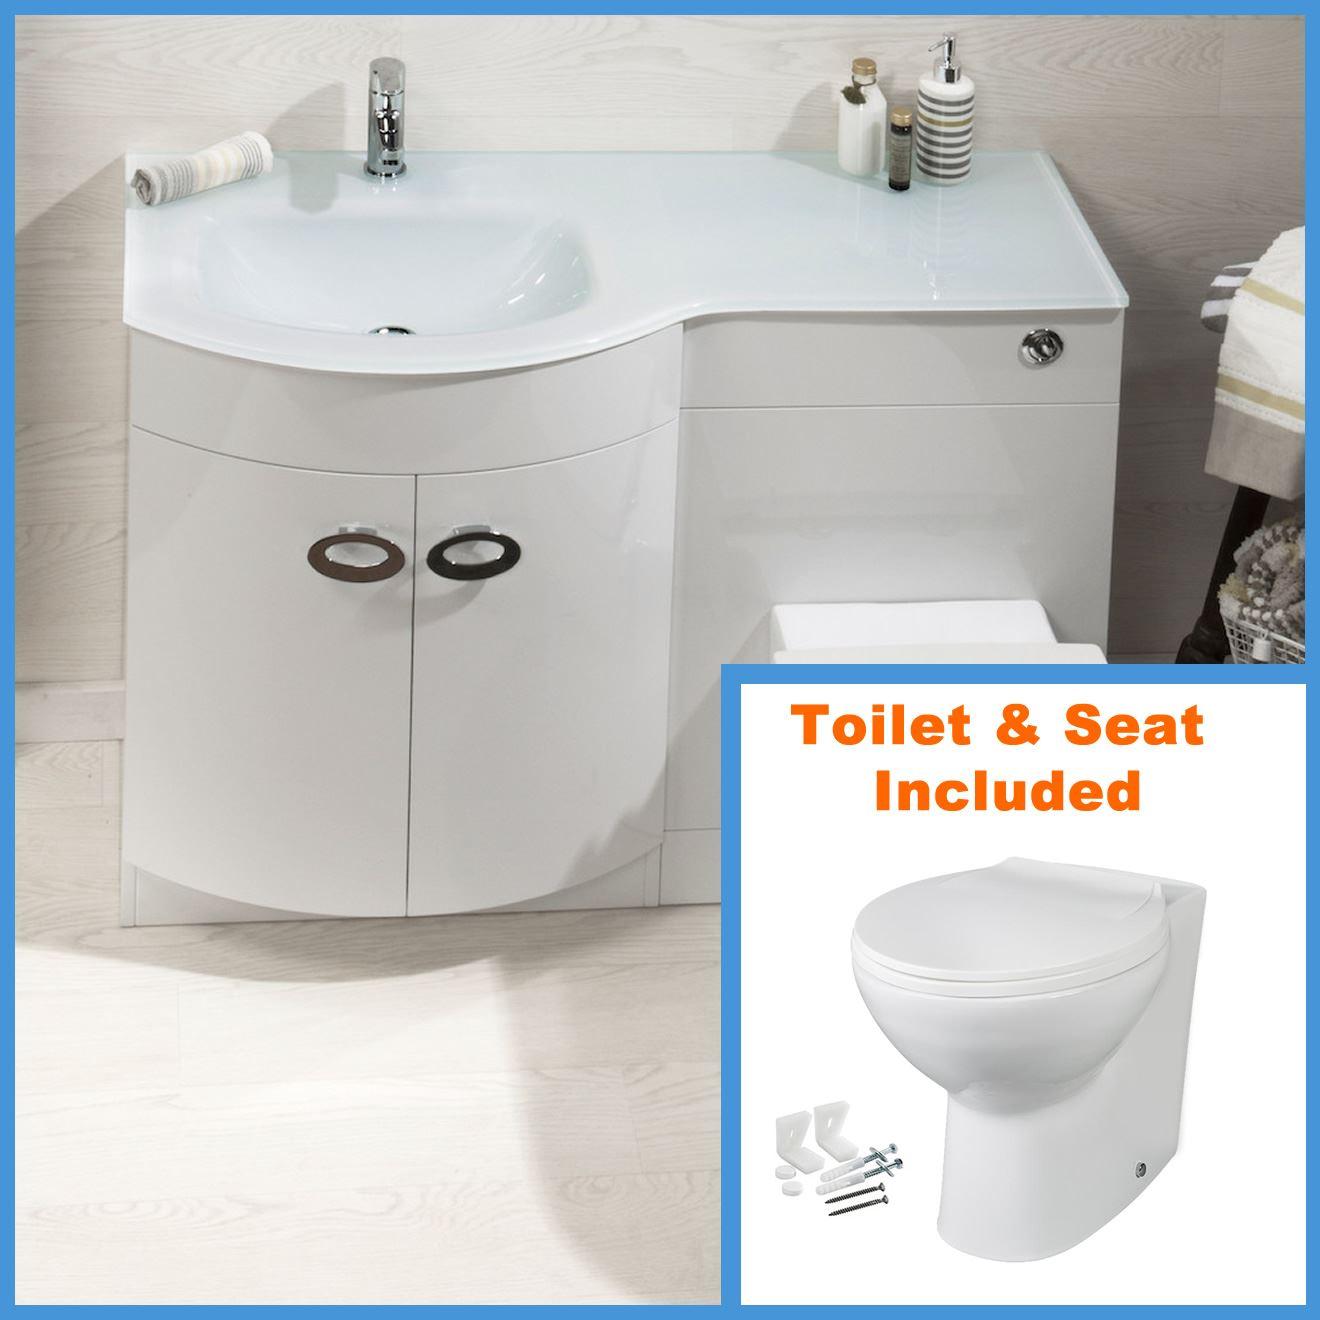 D shape bathroom vanity unit basin sink bathroom wc unit btw toilet white glass ebay for Bathroom sink and toilet units